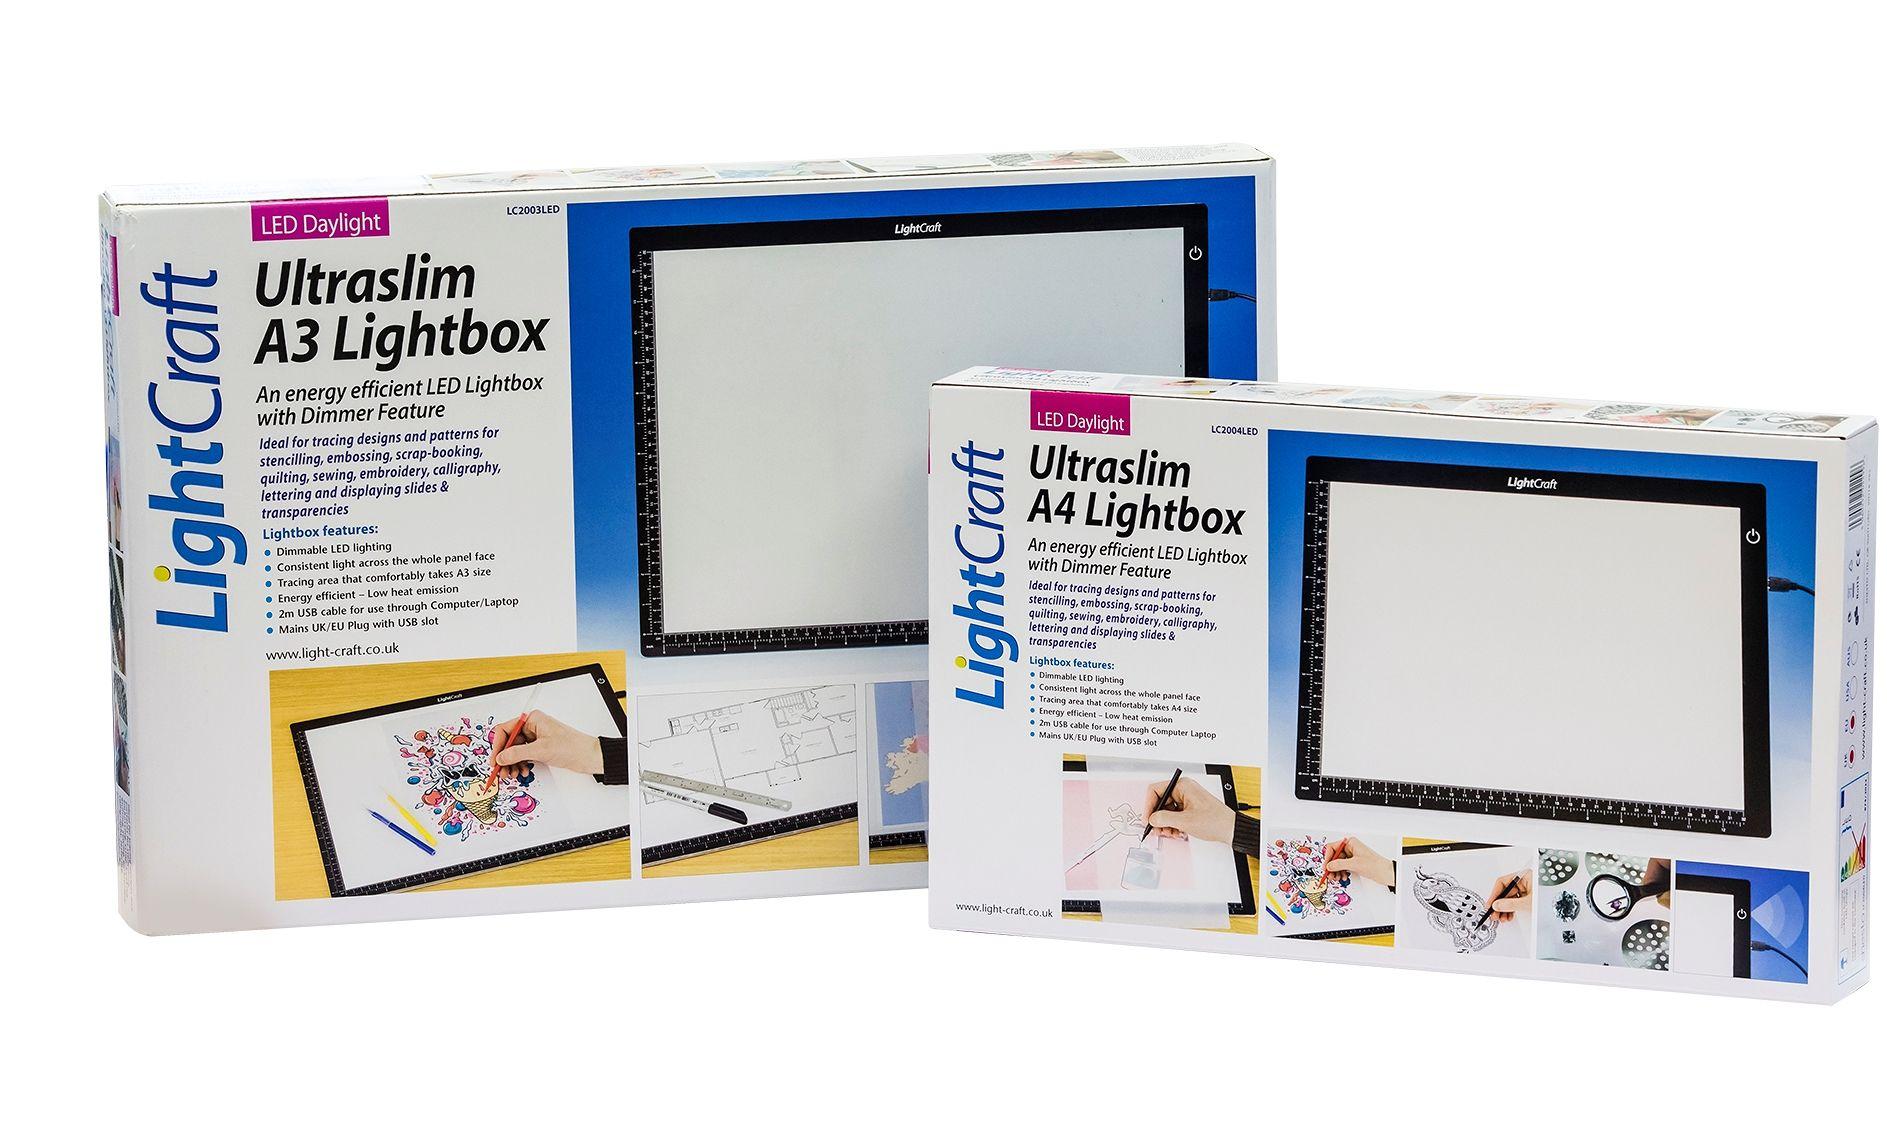 lightbox led square artsup art artlogic light products supplies box